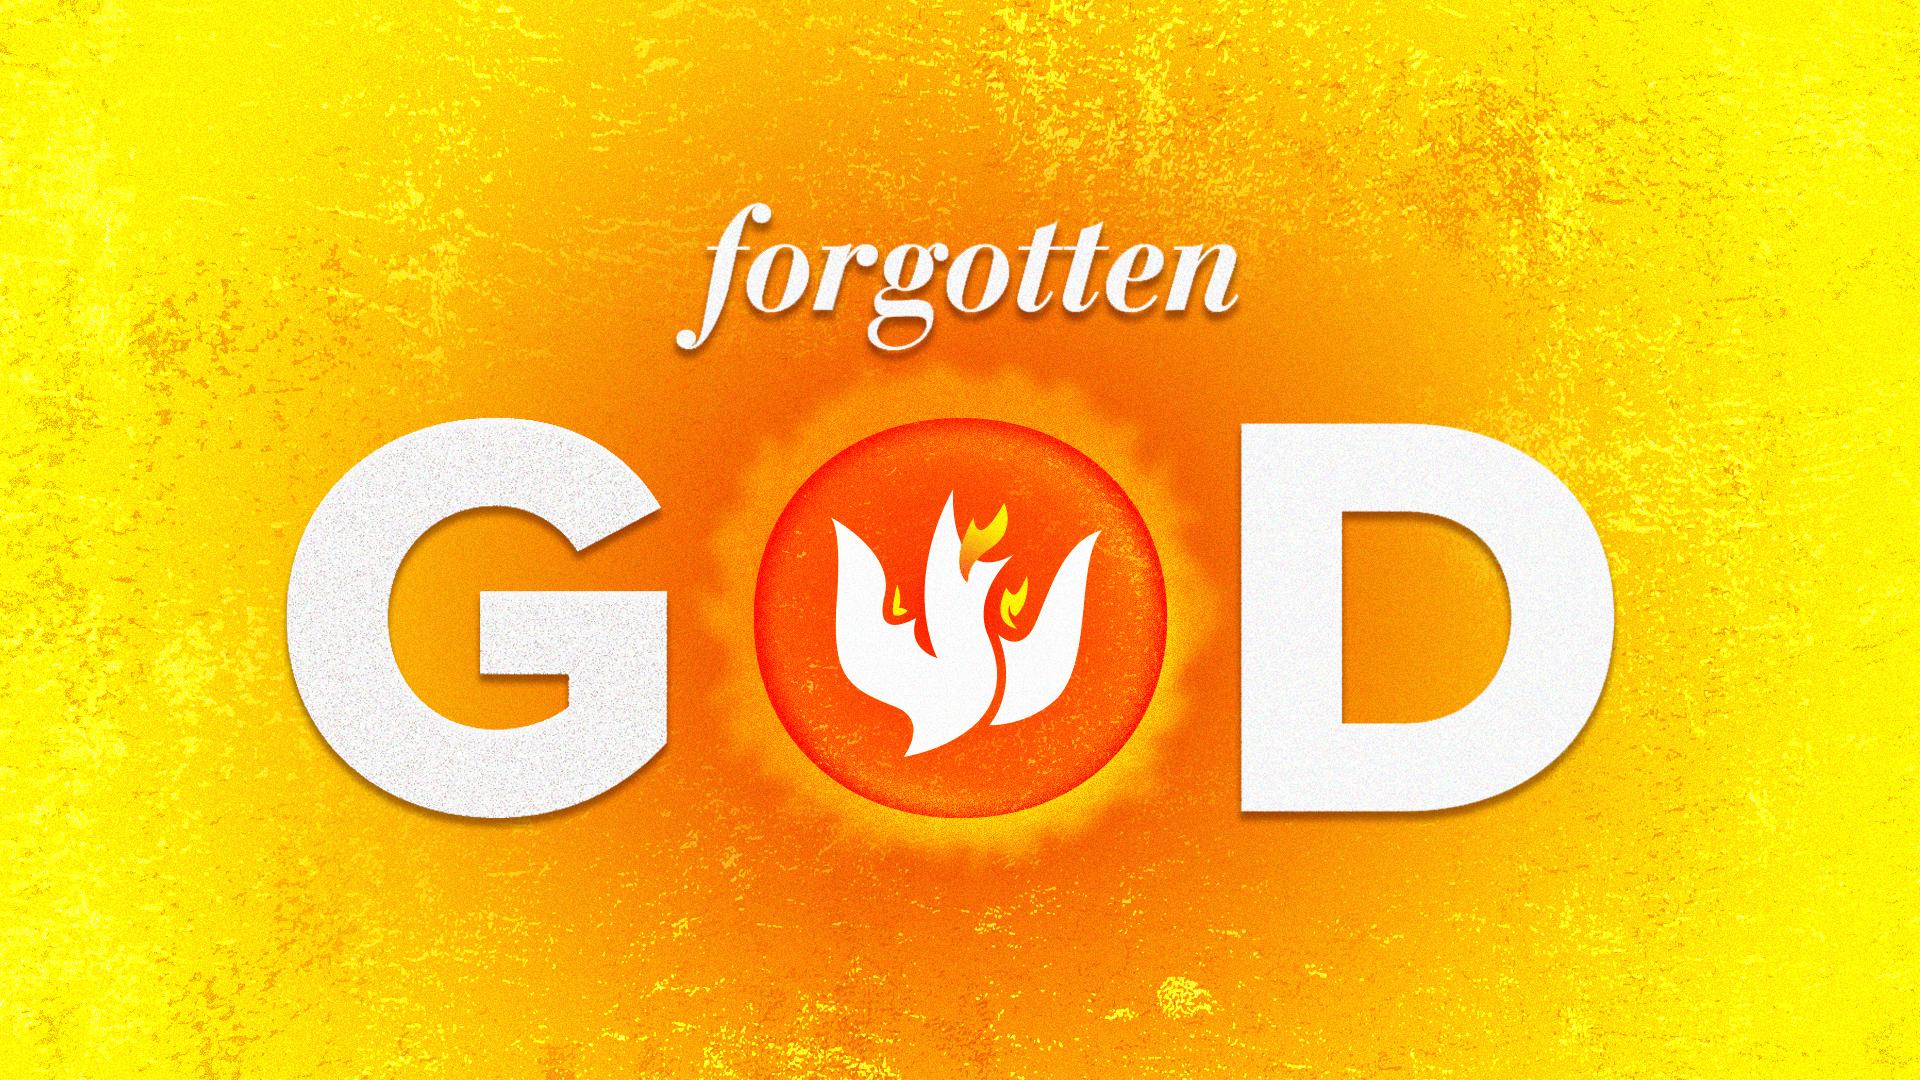 Forgotten_God_Slide_V1_1920x1080.png